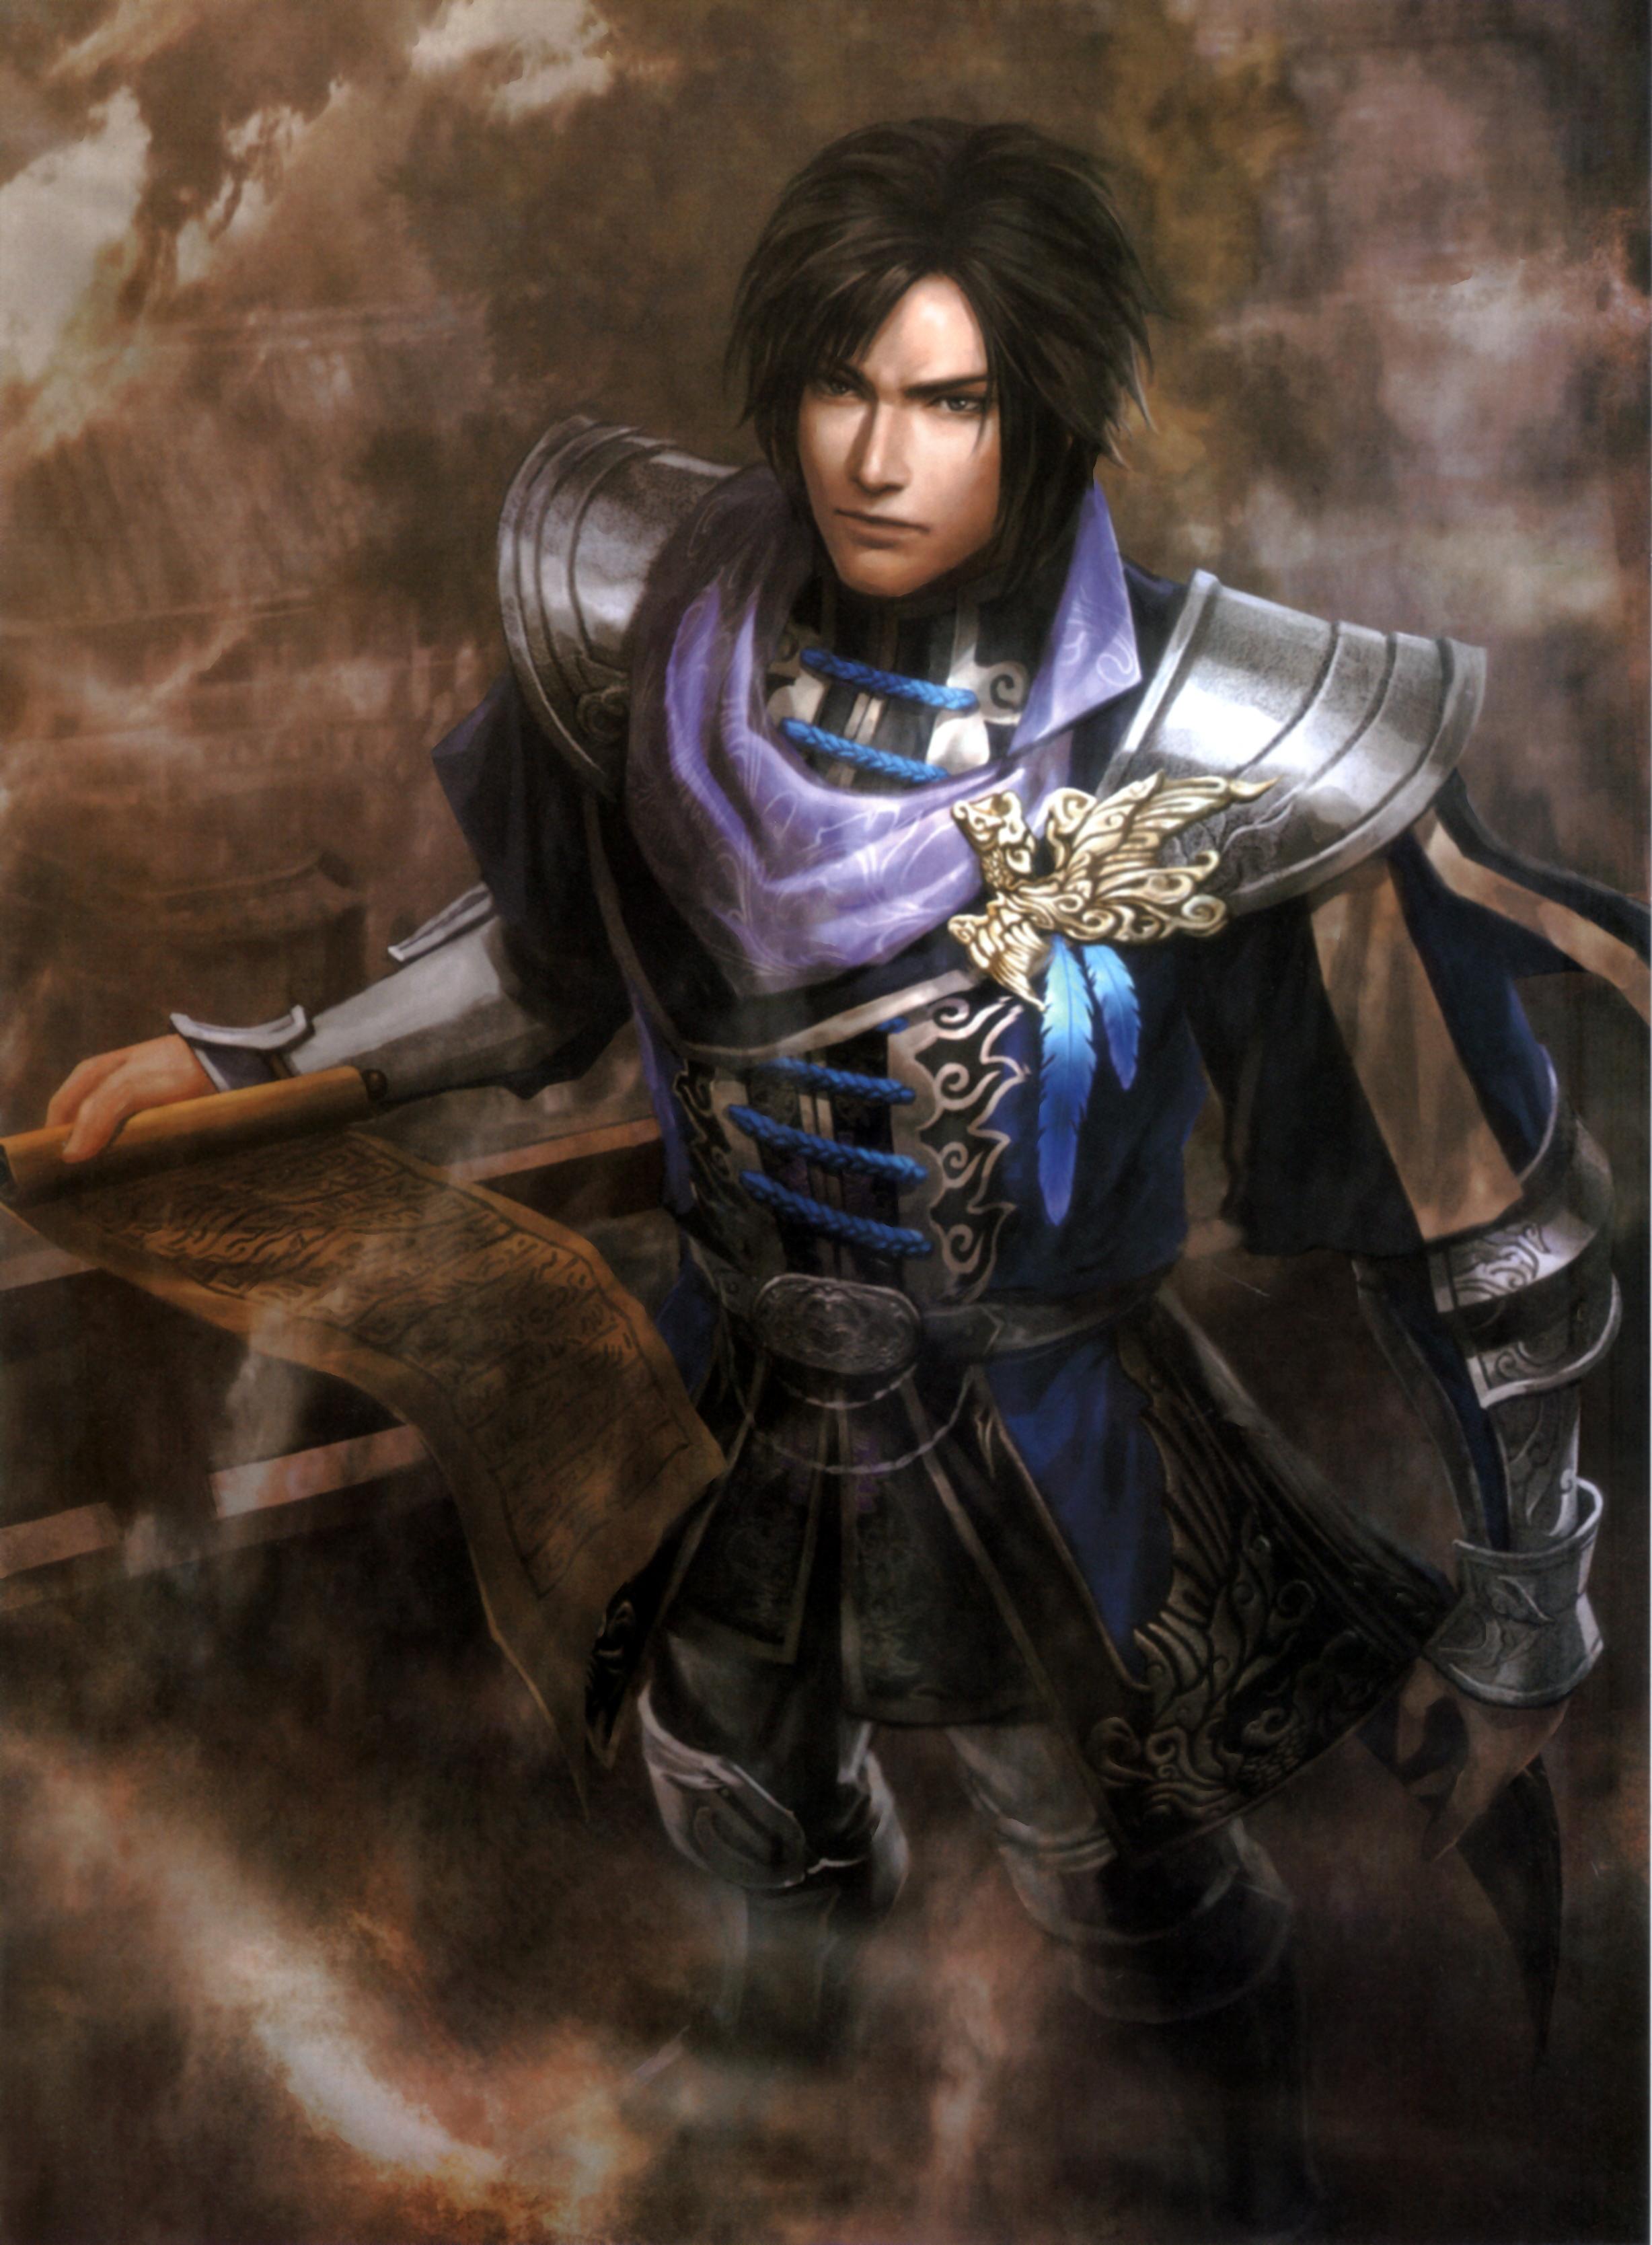 Dynasty Warriors 8: Cao Cao (Close Up) by nadinepazkye on ... |Cao Cao Dynasty Warriors 8